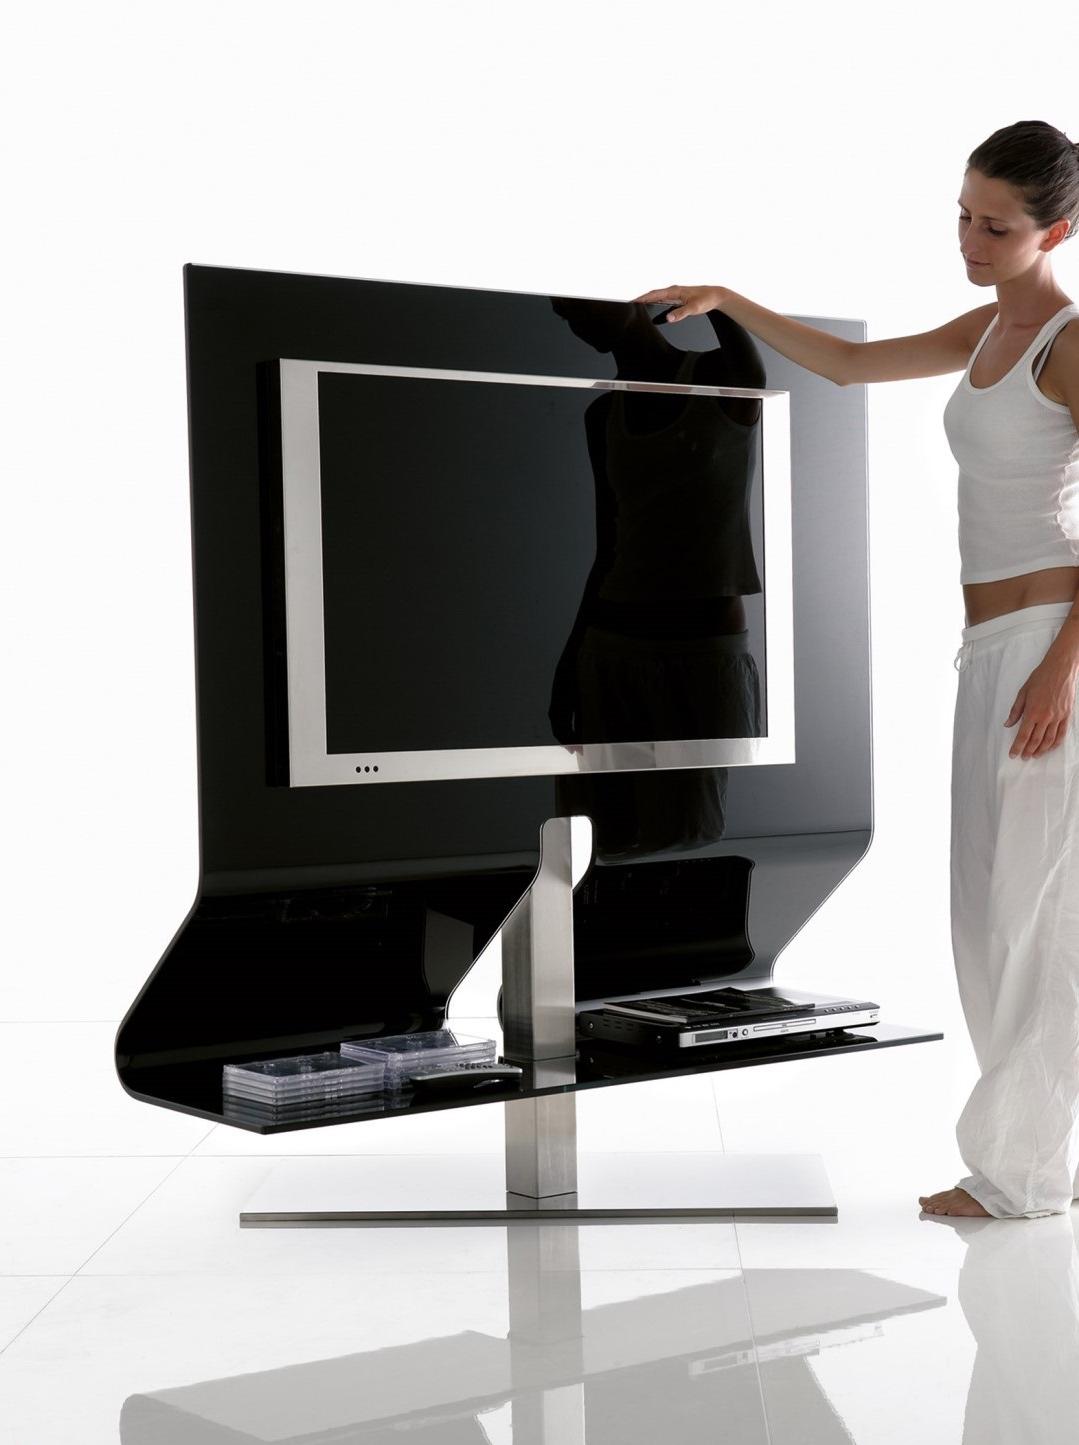 Mueble Tv Giratorio 360 0gdr Muebles Tv Cristal Muebles De Aluminio Y Cristal with Muebles Tv